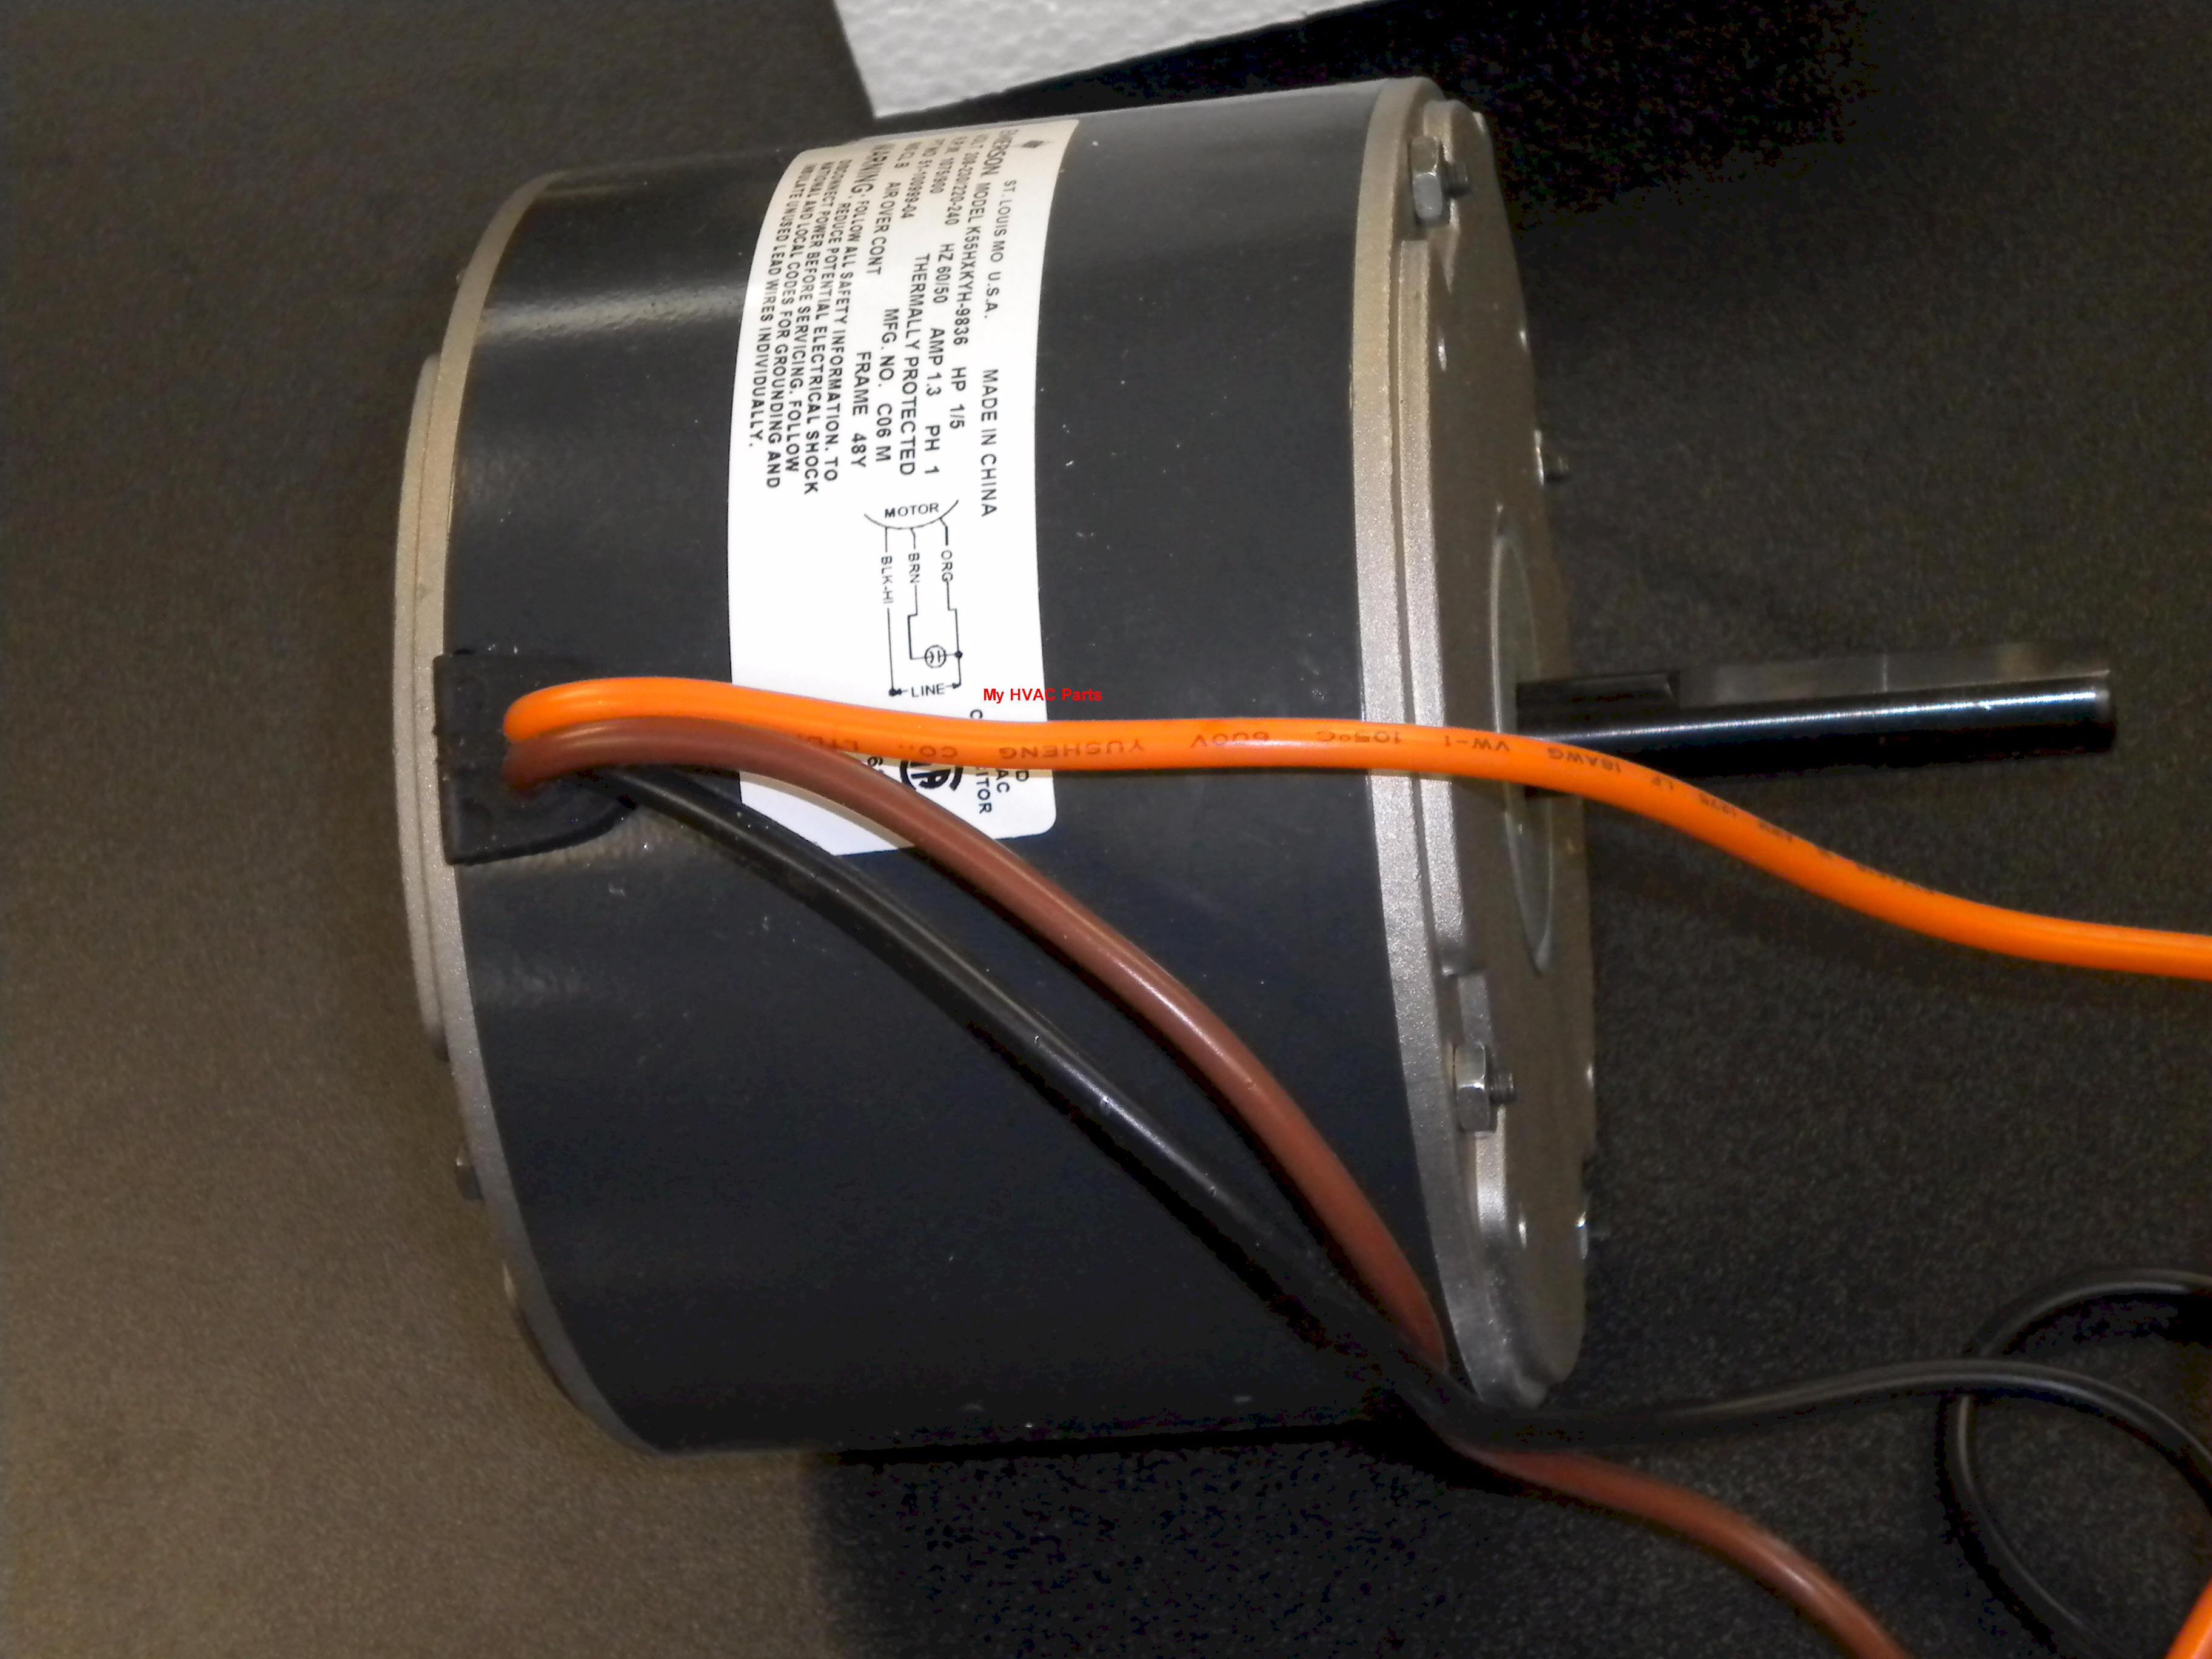 horton c2150 wiring diagram 3 way switching frs26zgew2 diagram,zgew • webbmarketing.co